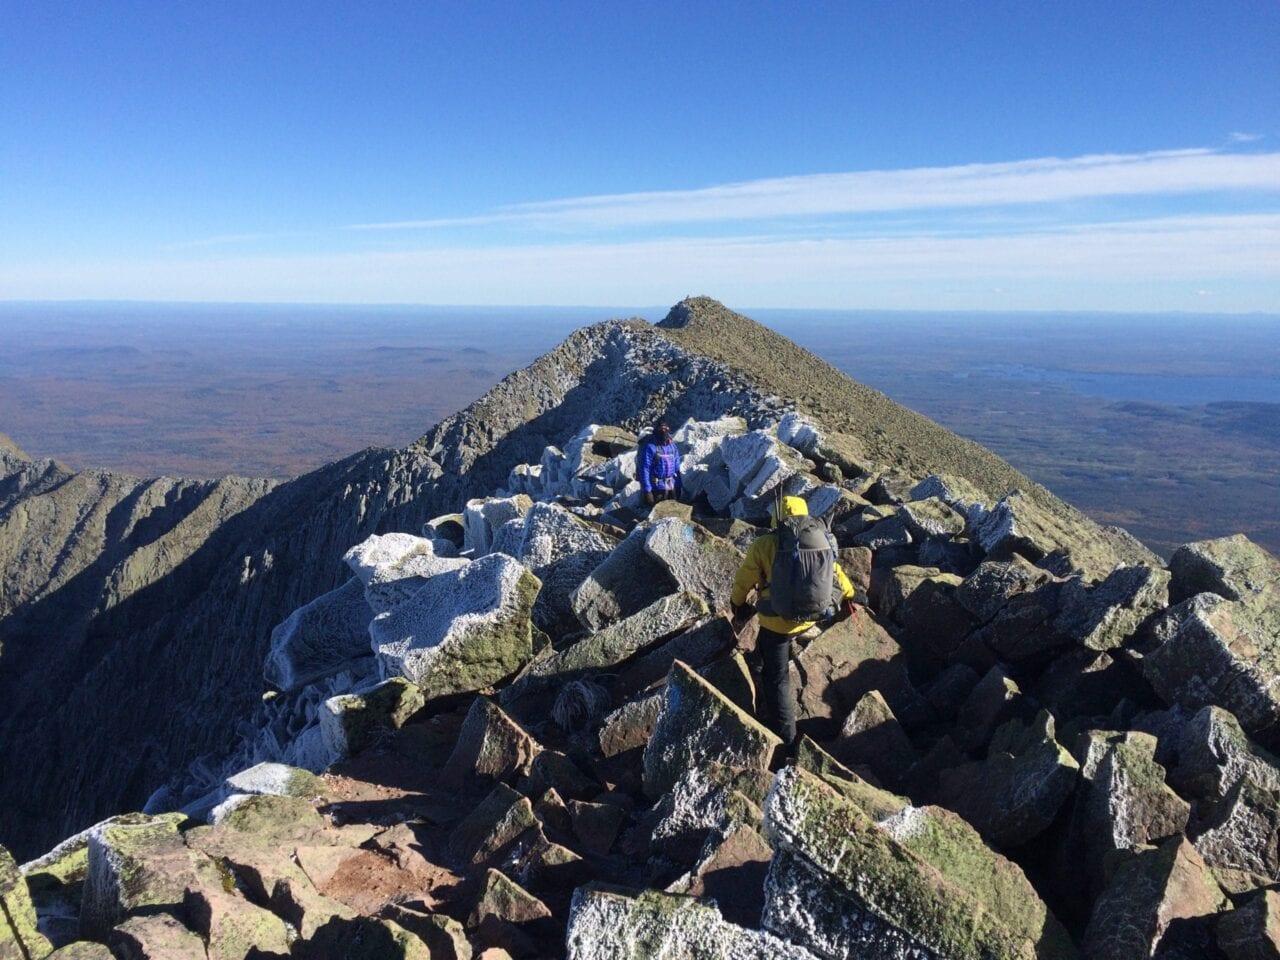 A rocky ridgeline overlooks a distant valley.